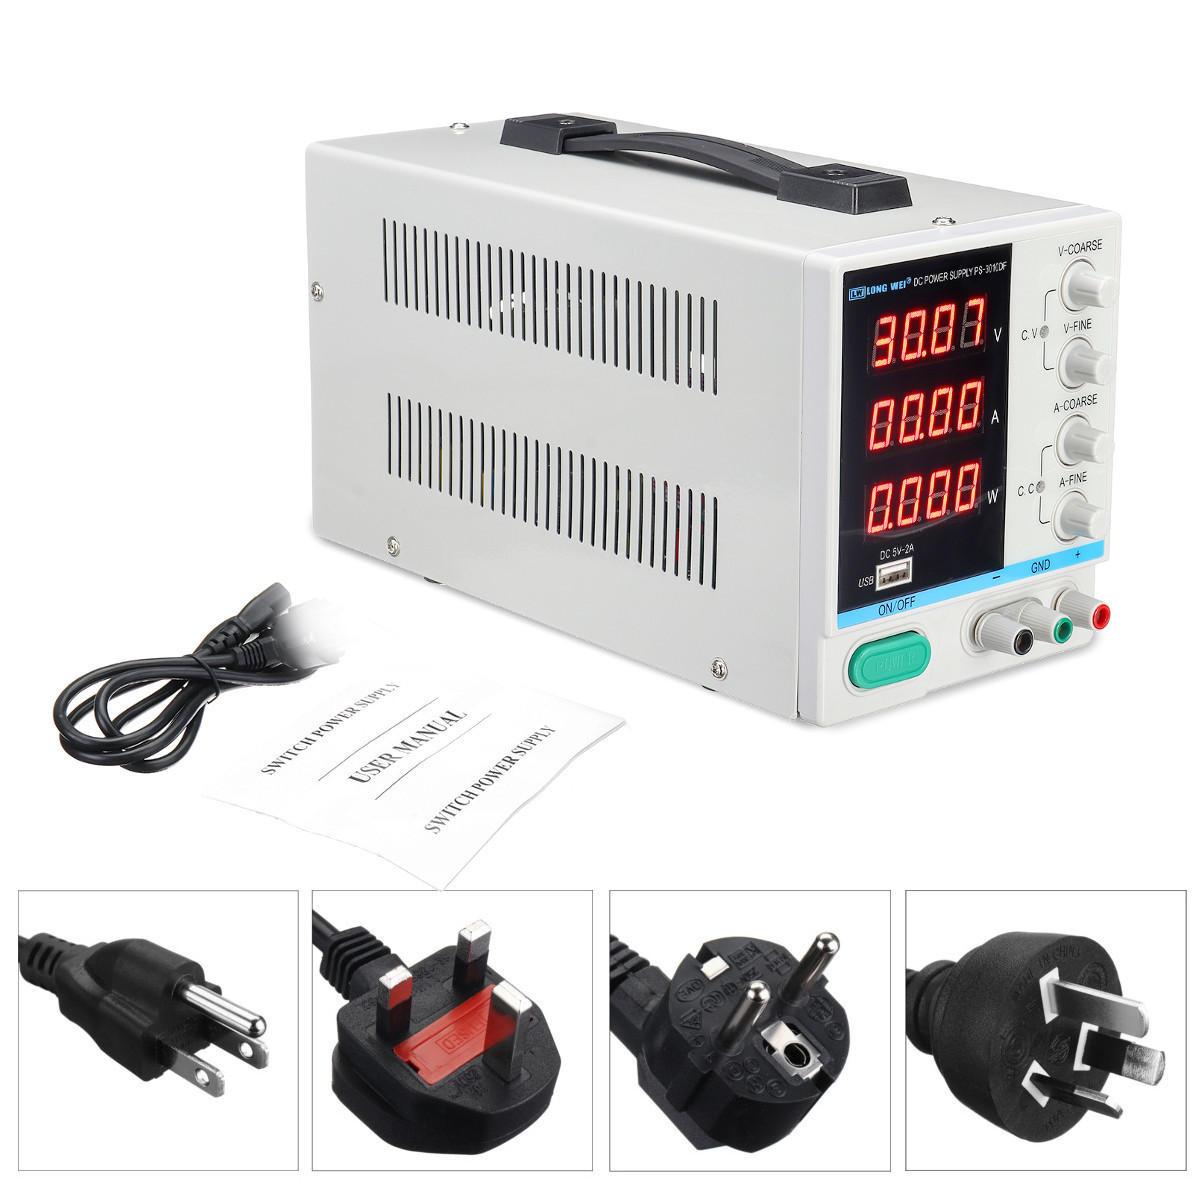 LONG WEI PS-3010DF 110V/220V DC Power Supply 30V 10A Precision Variable LED Digital Lab Adjustable W/ USB